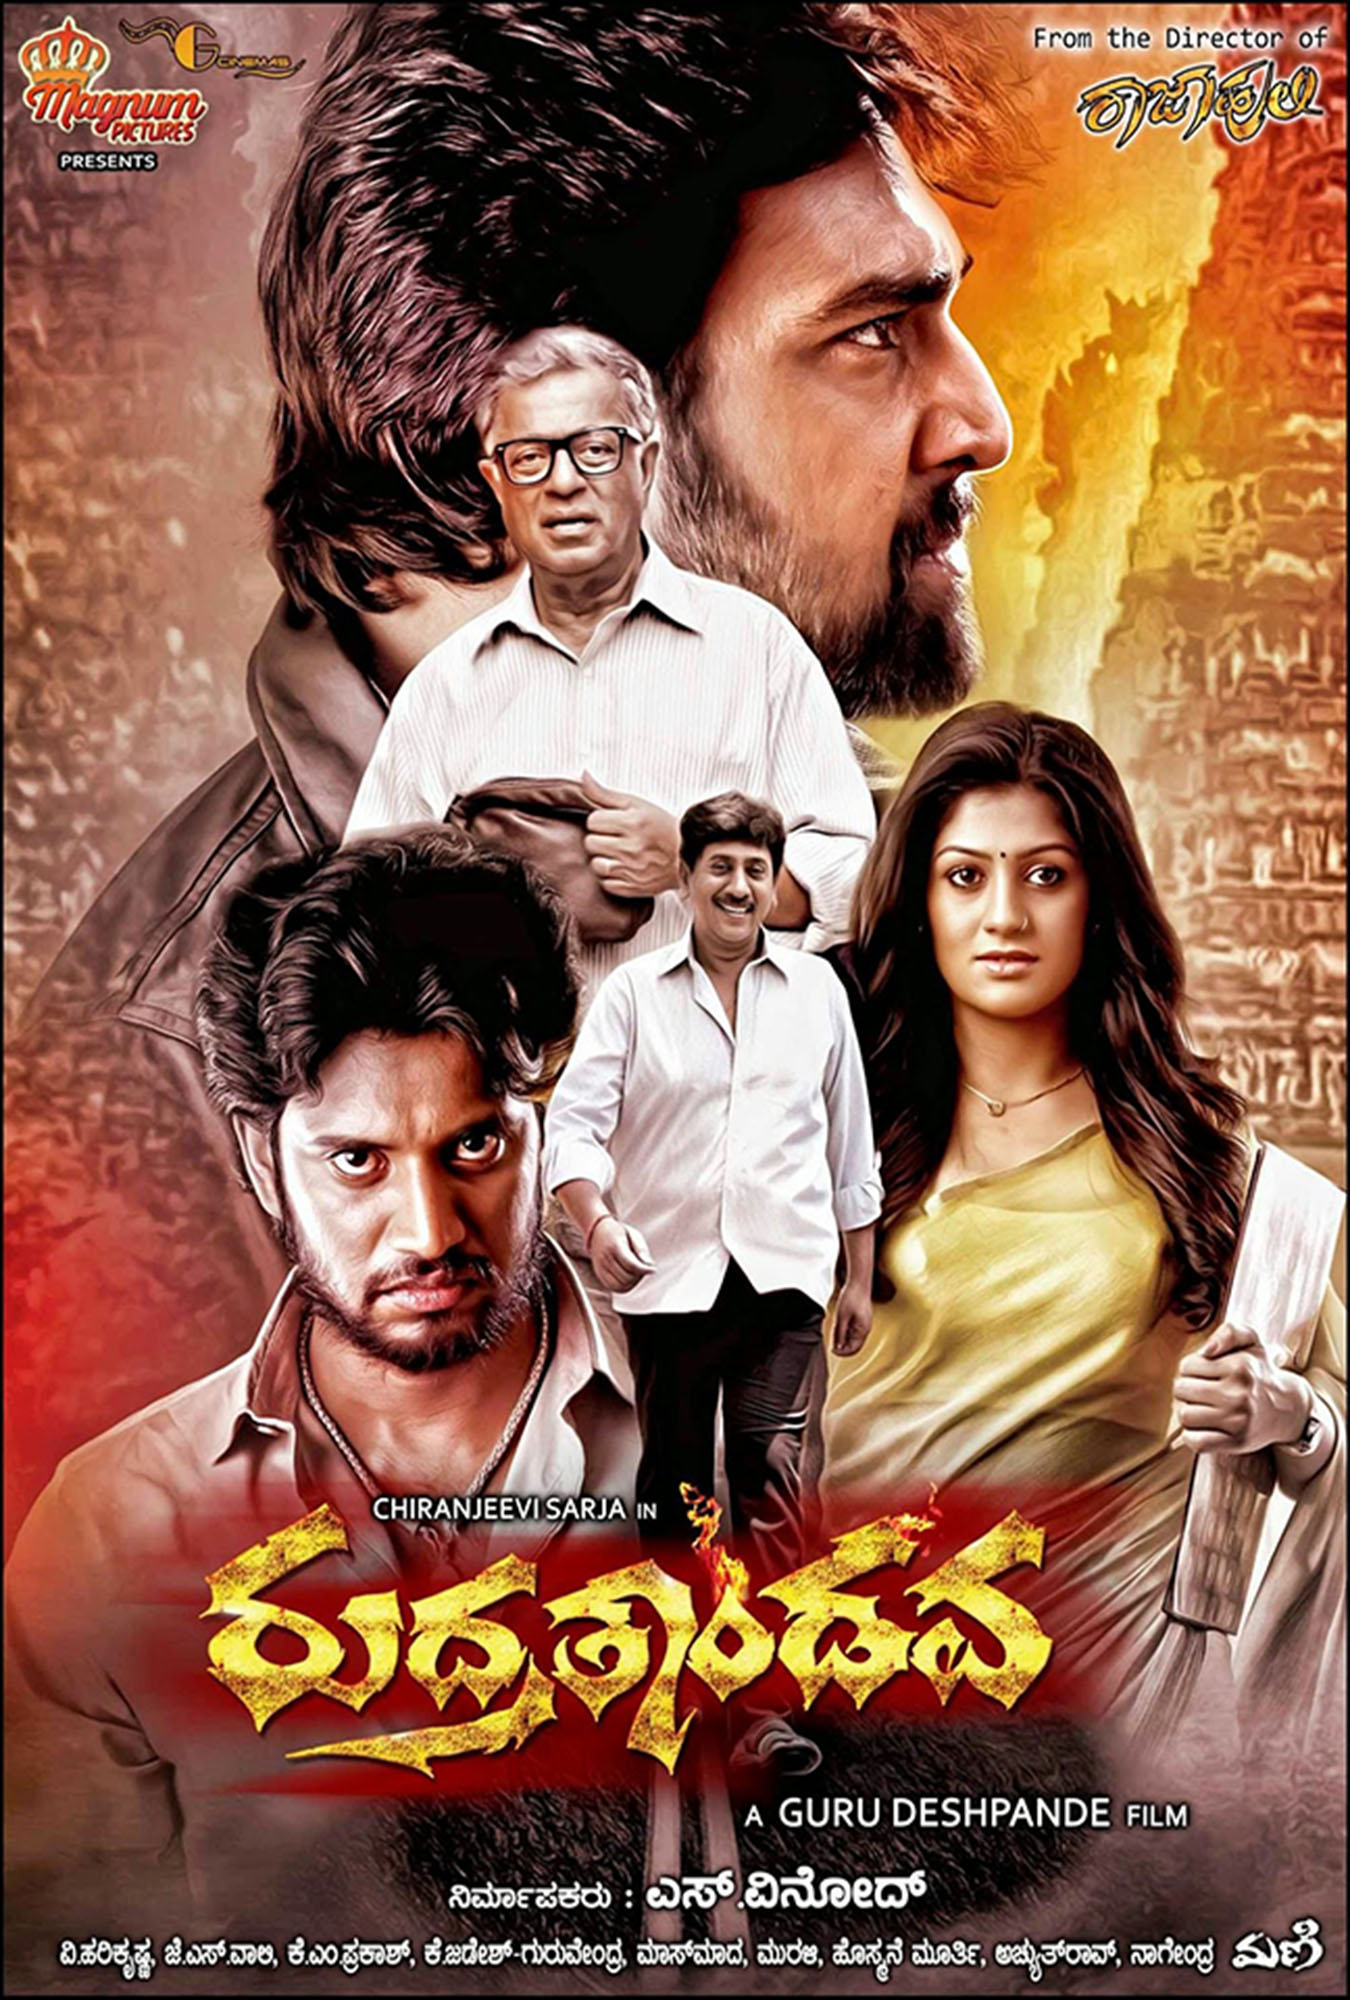 Rudra Tandava (2021) Hindi Dubbed Movie 720p HDRip AAC